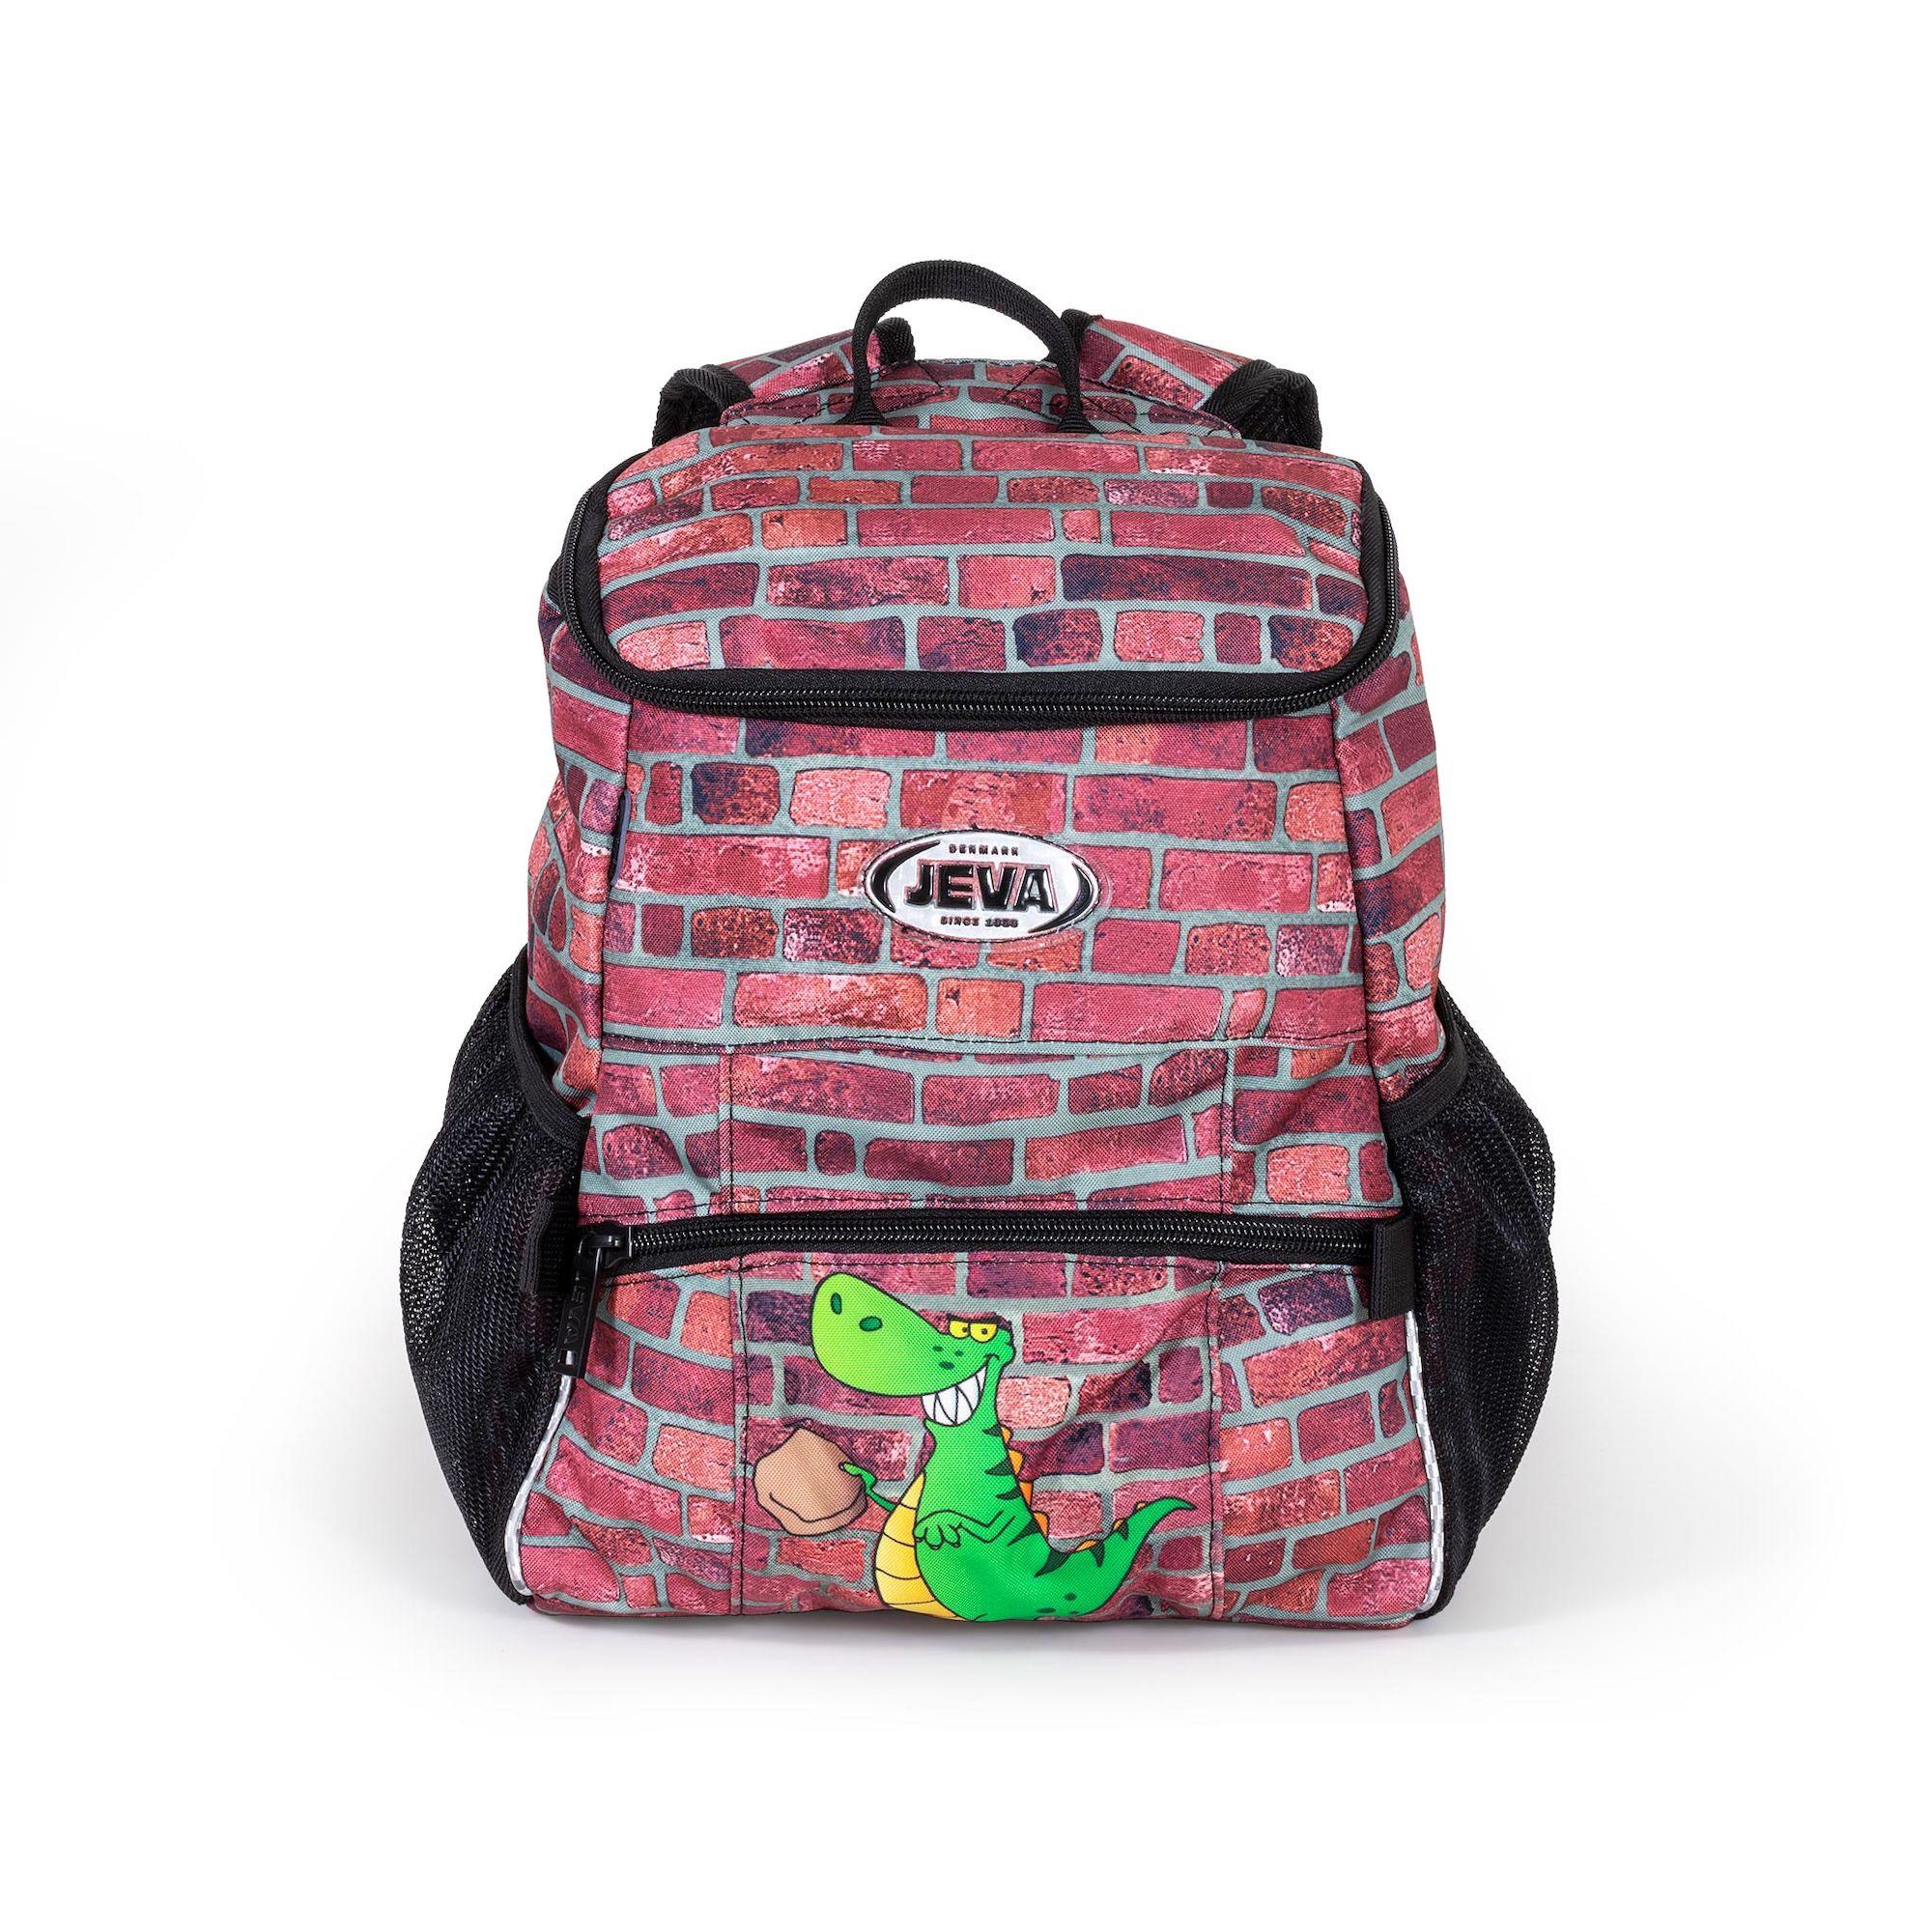 Jeva Preschool Ryggsäck 8L, Dusty